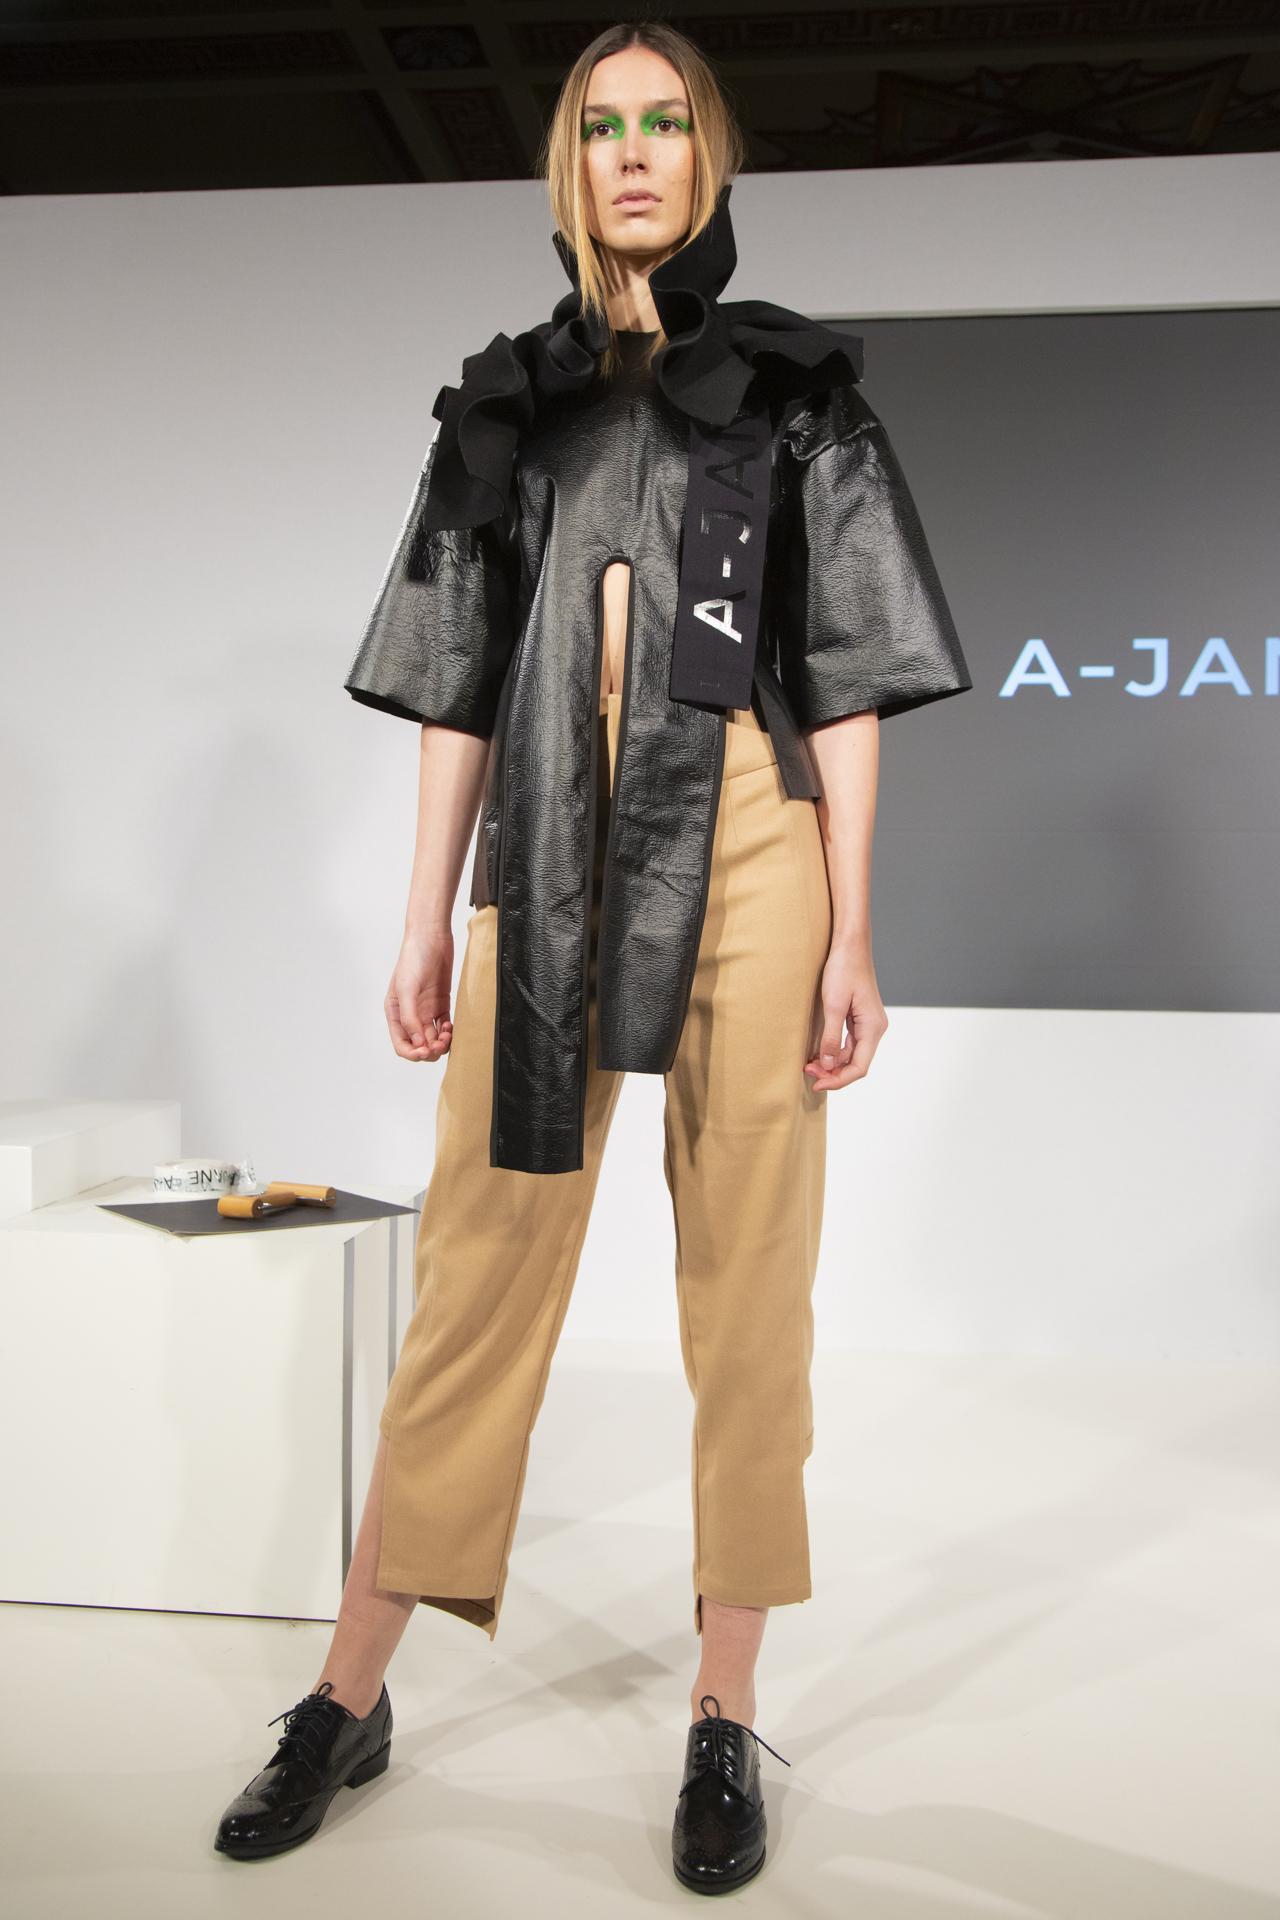 A-Jane_AW19_DSTNGR_2.JPG